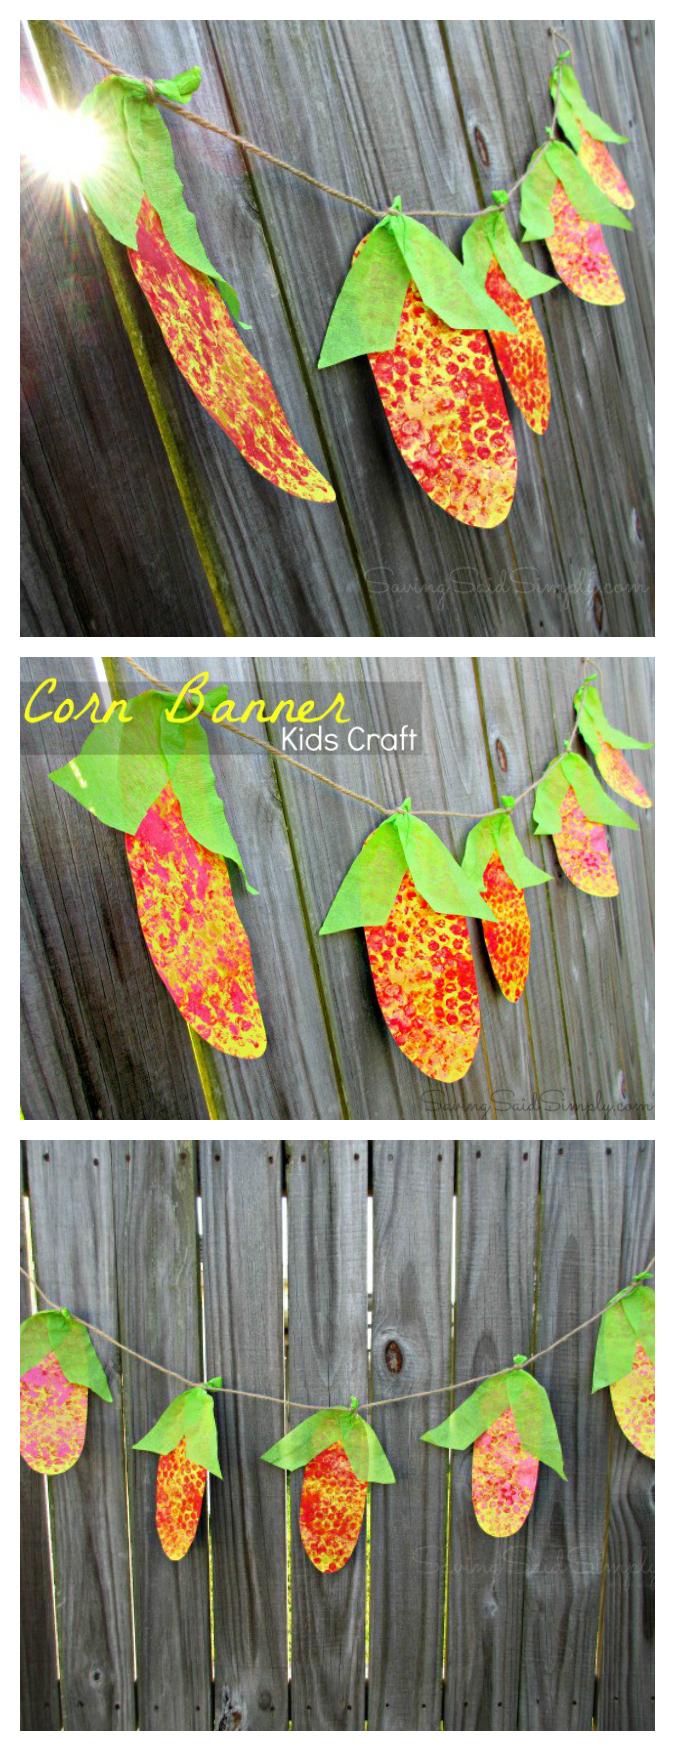 Corn garland craft pinterest